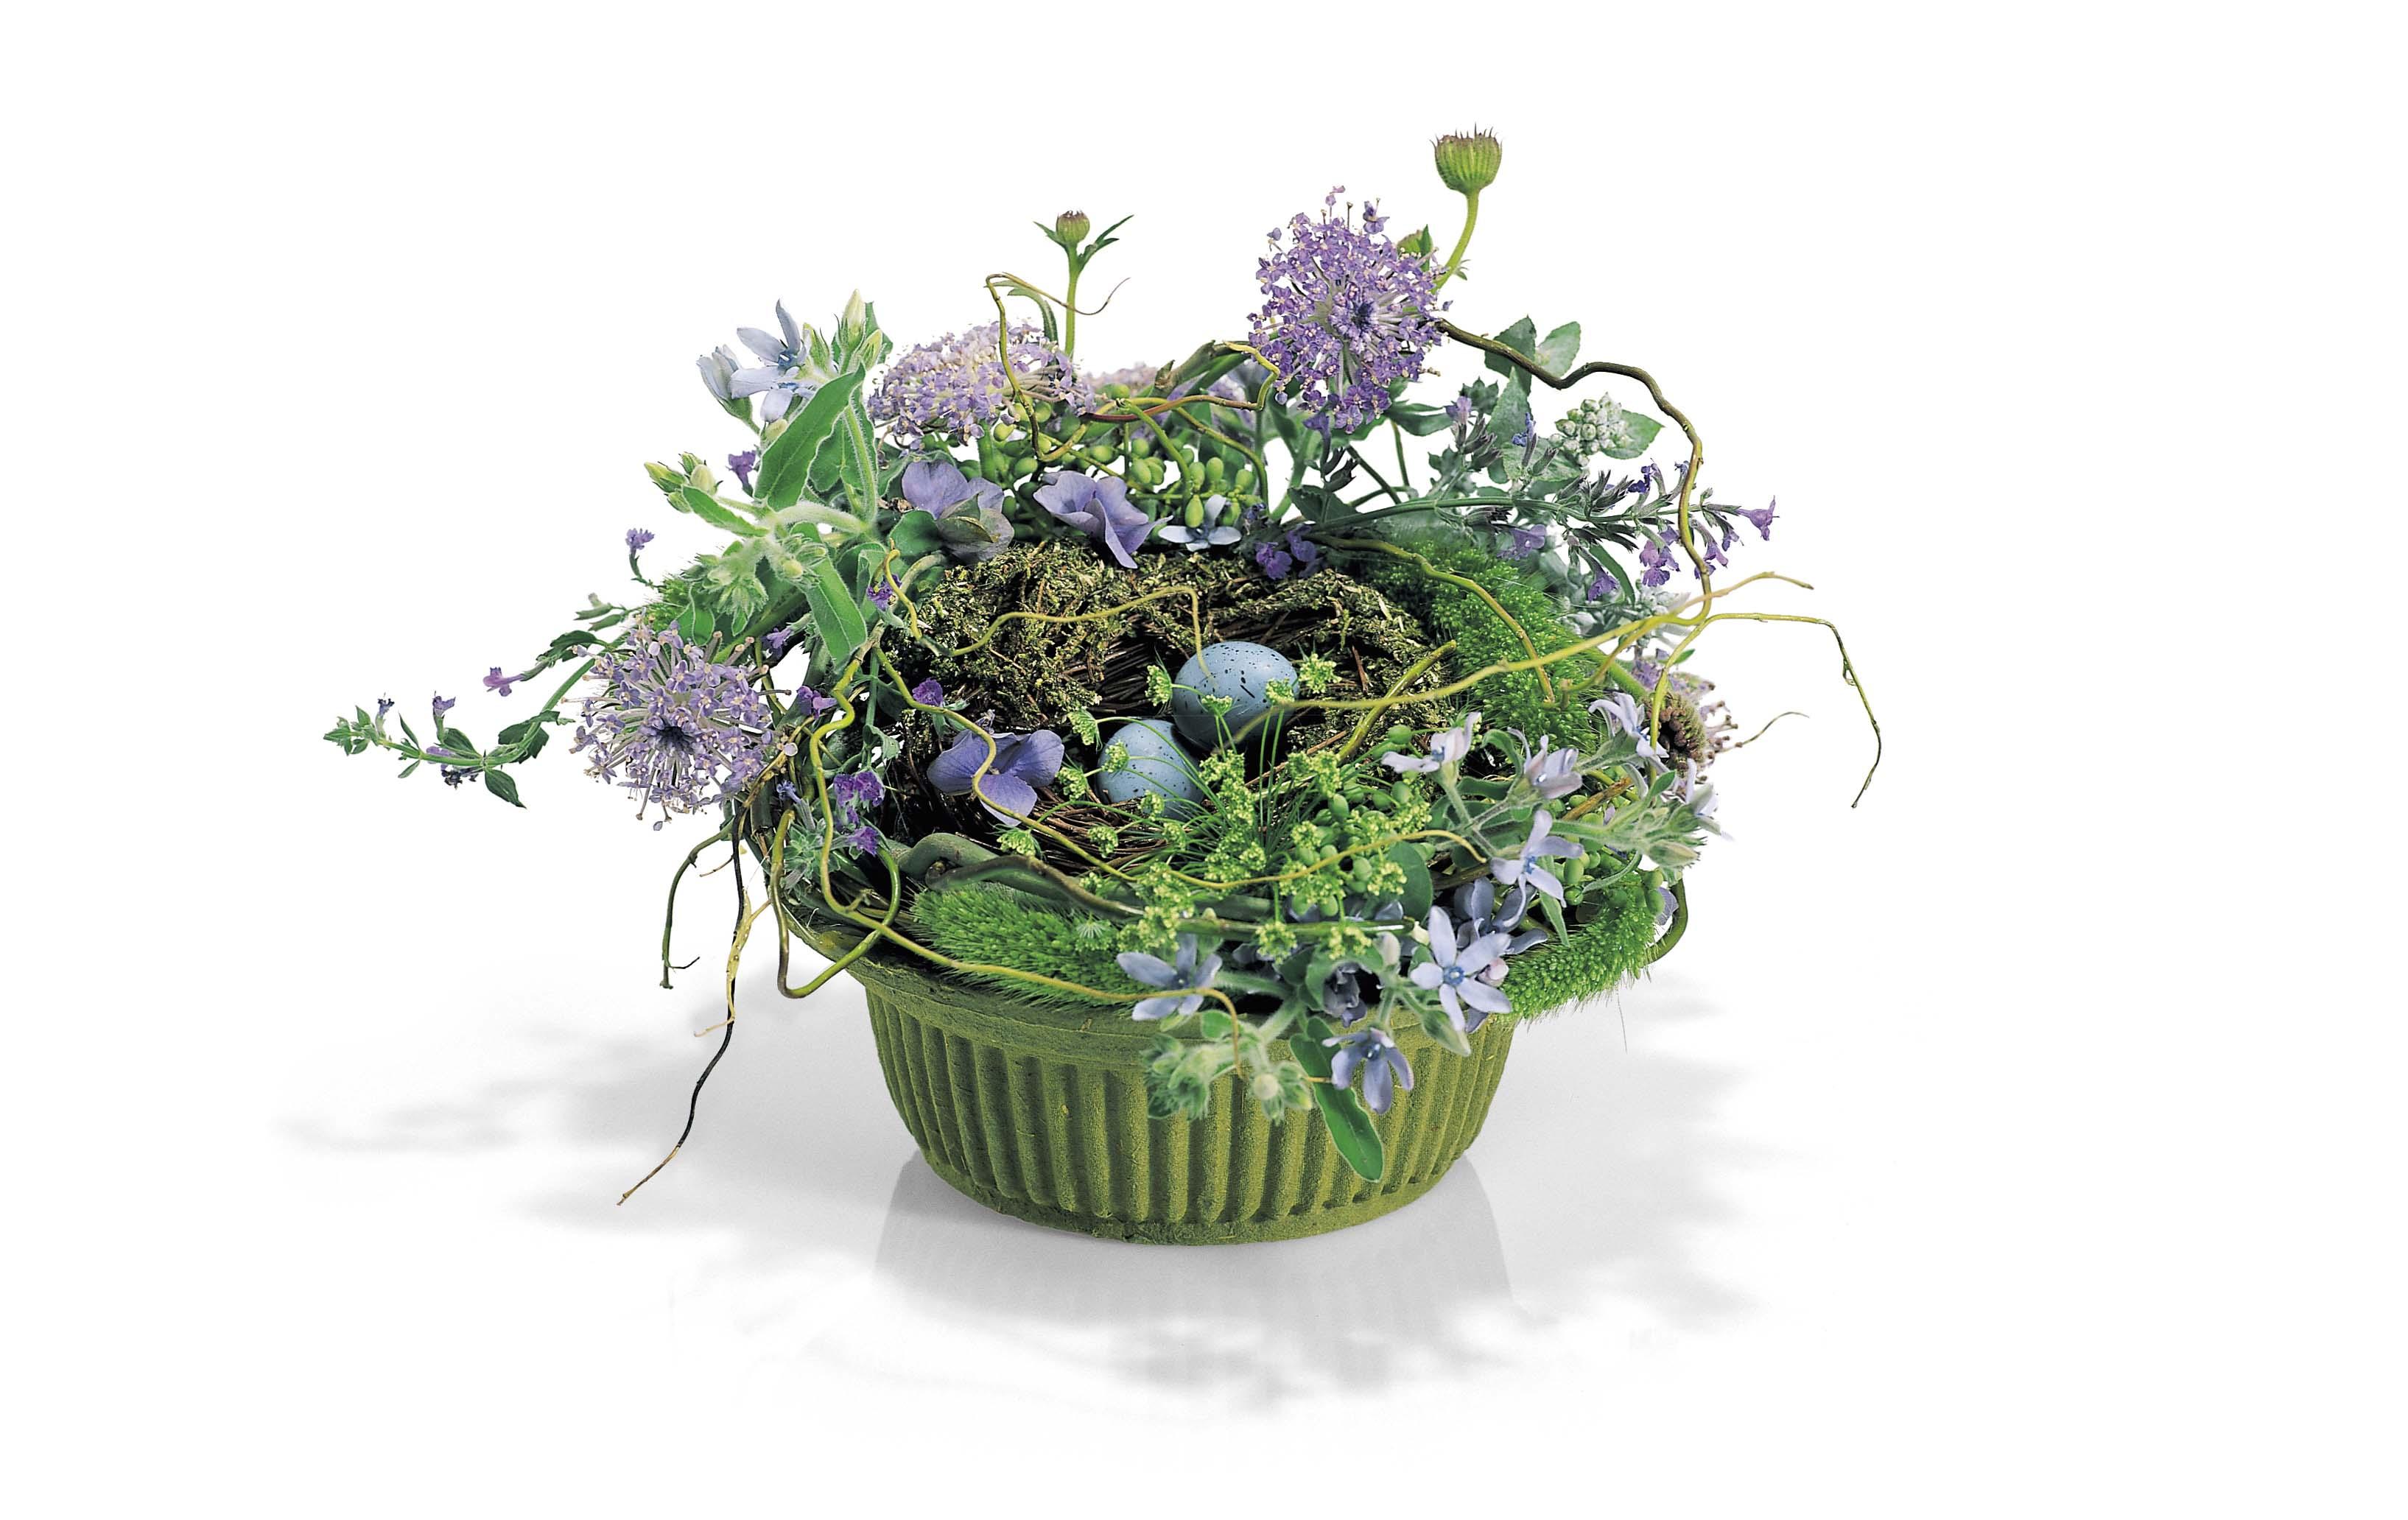 Wildflower with Nest